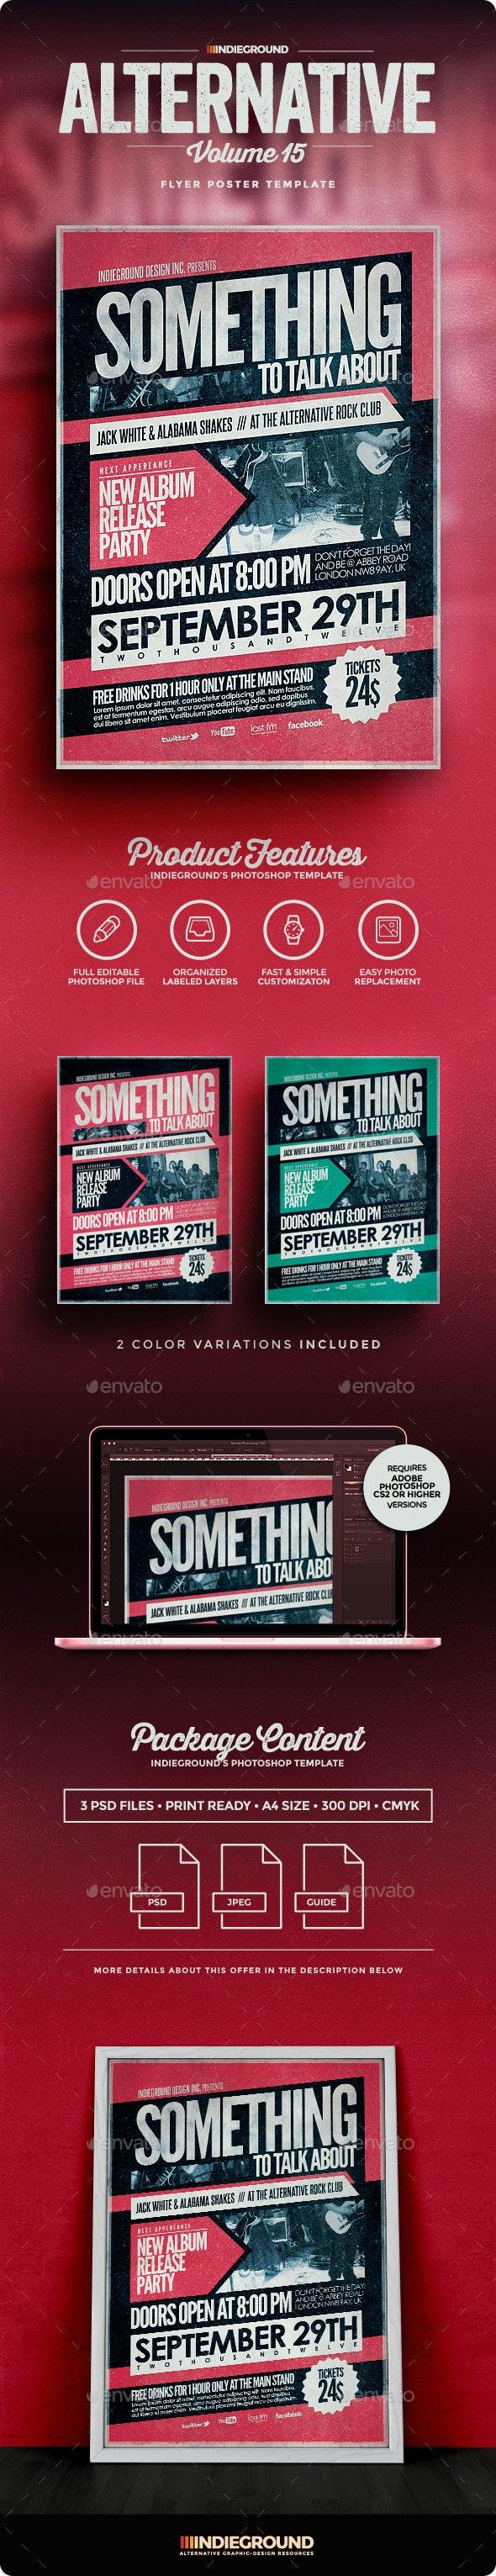 Alternative Flyer/Poster Vol. 15 - Concerts Events